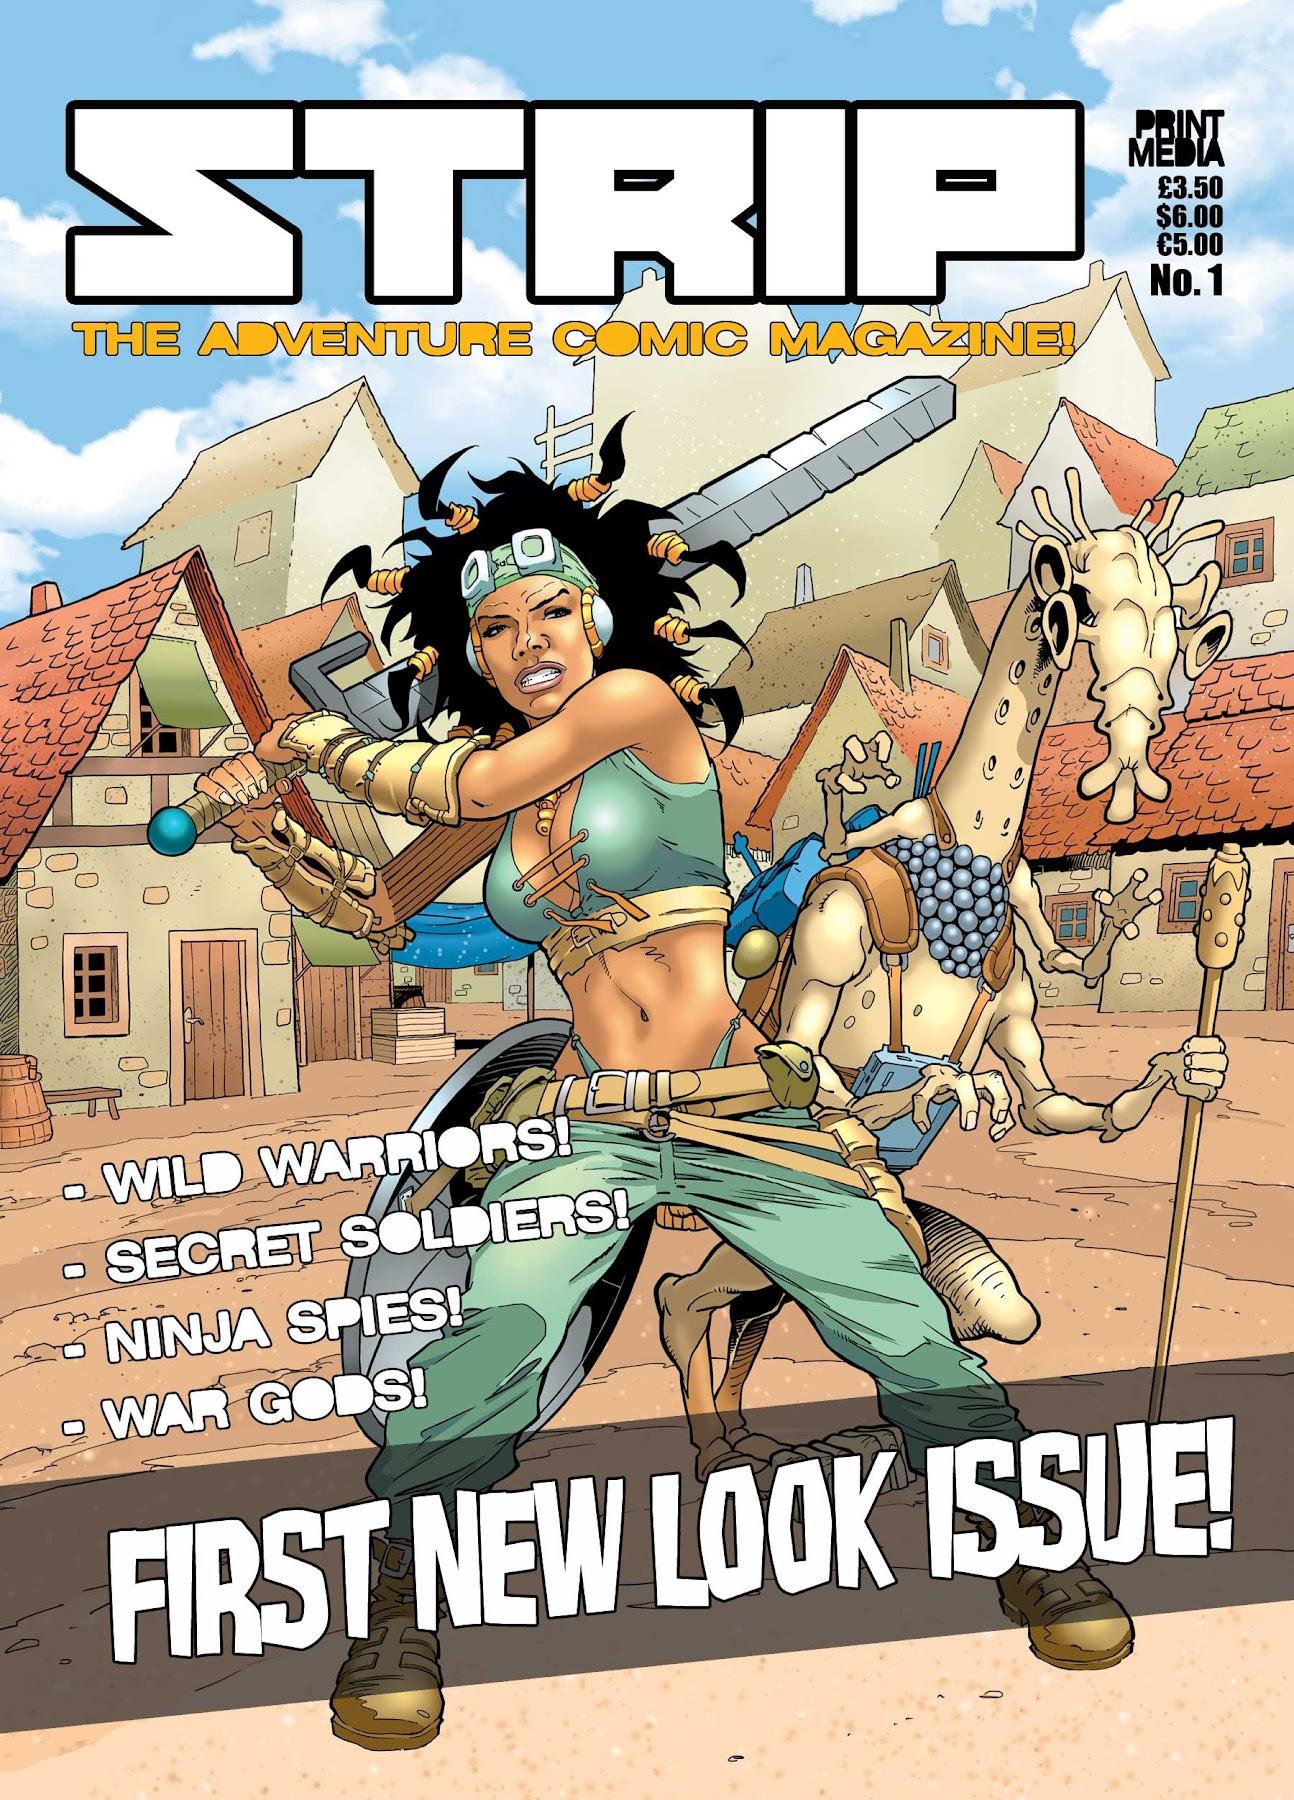 bd-magazine-issue-2-mediafire